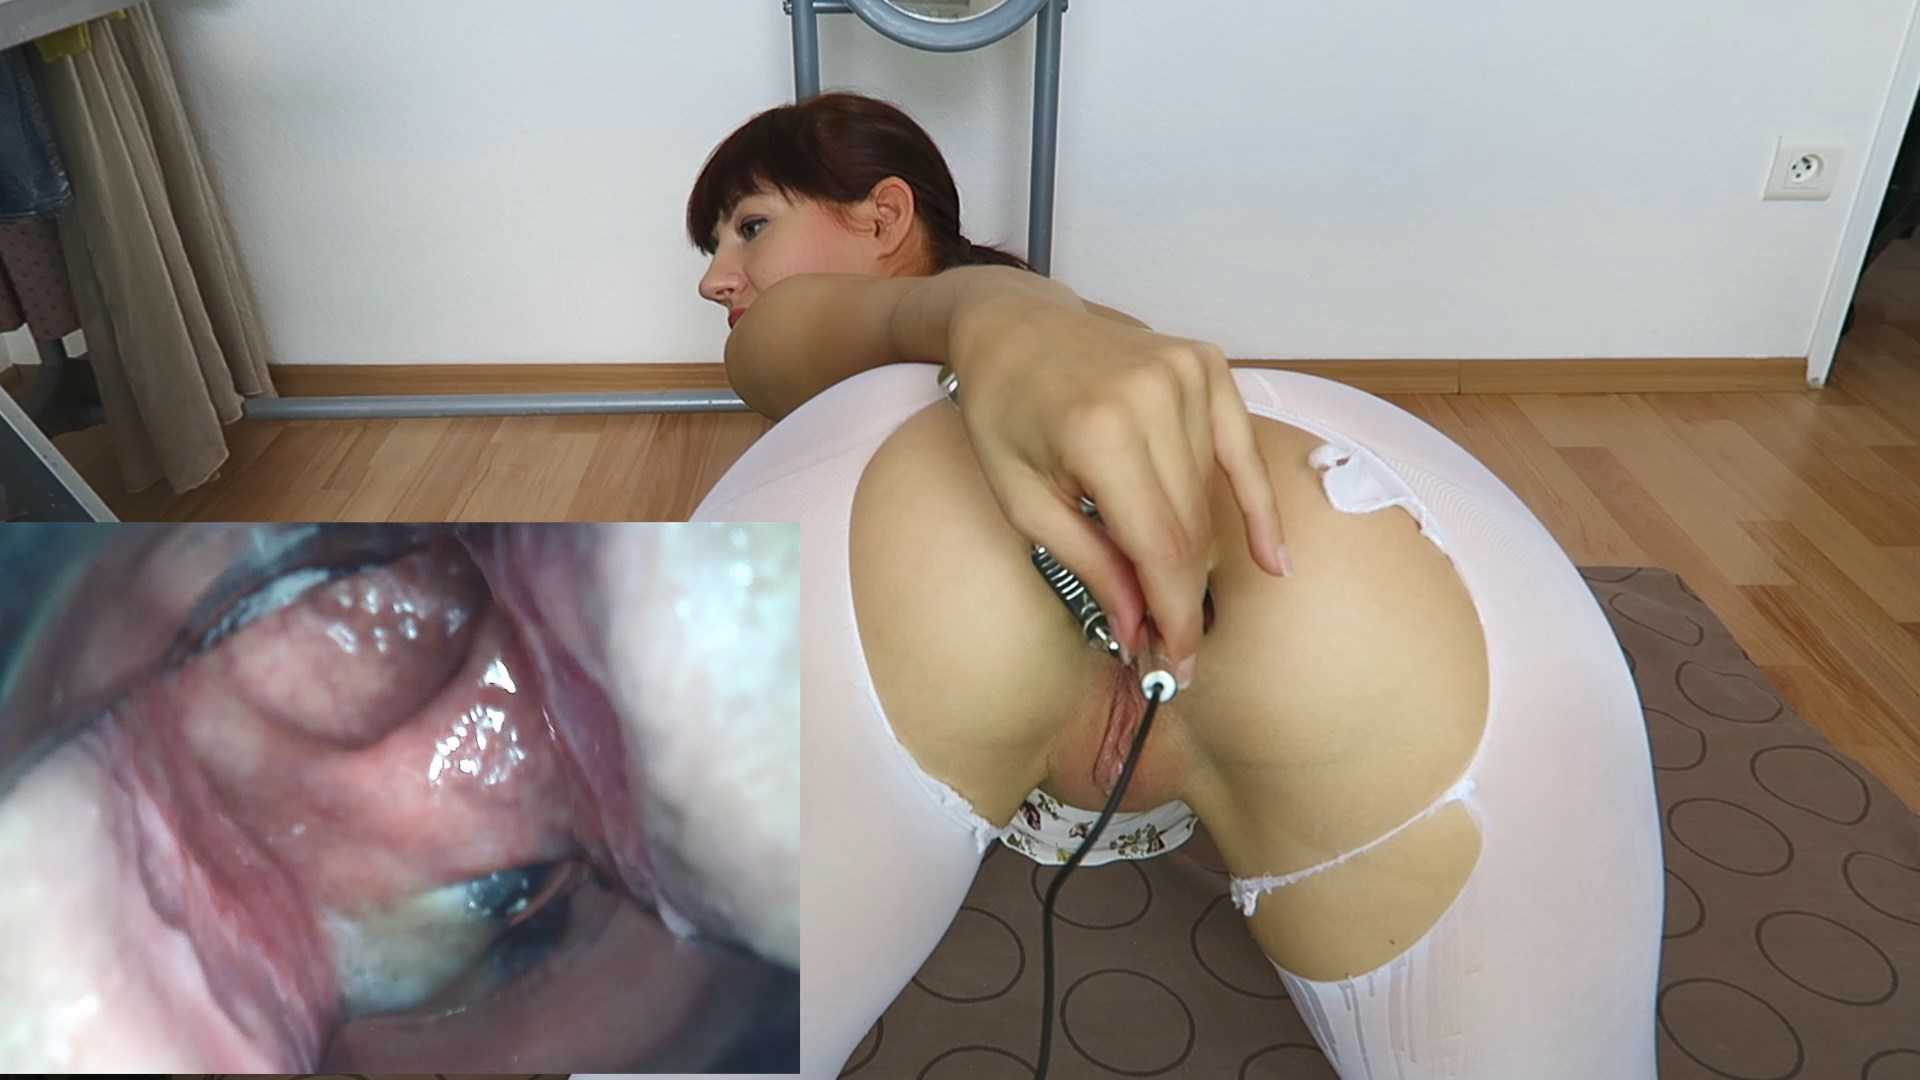 Camera inside pussy during cum